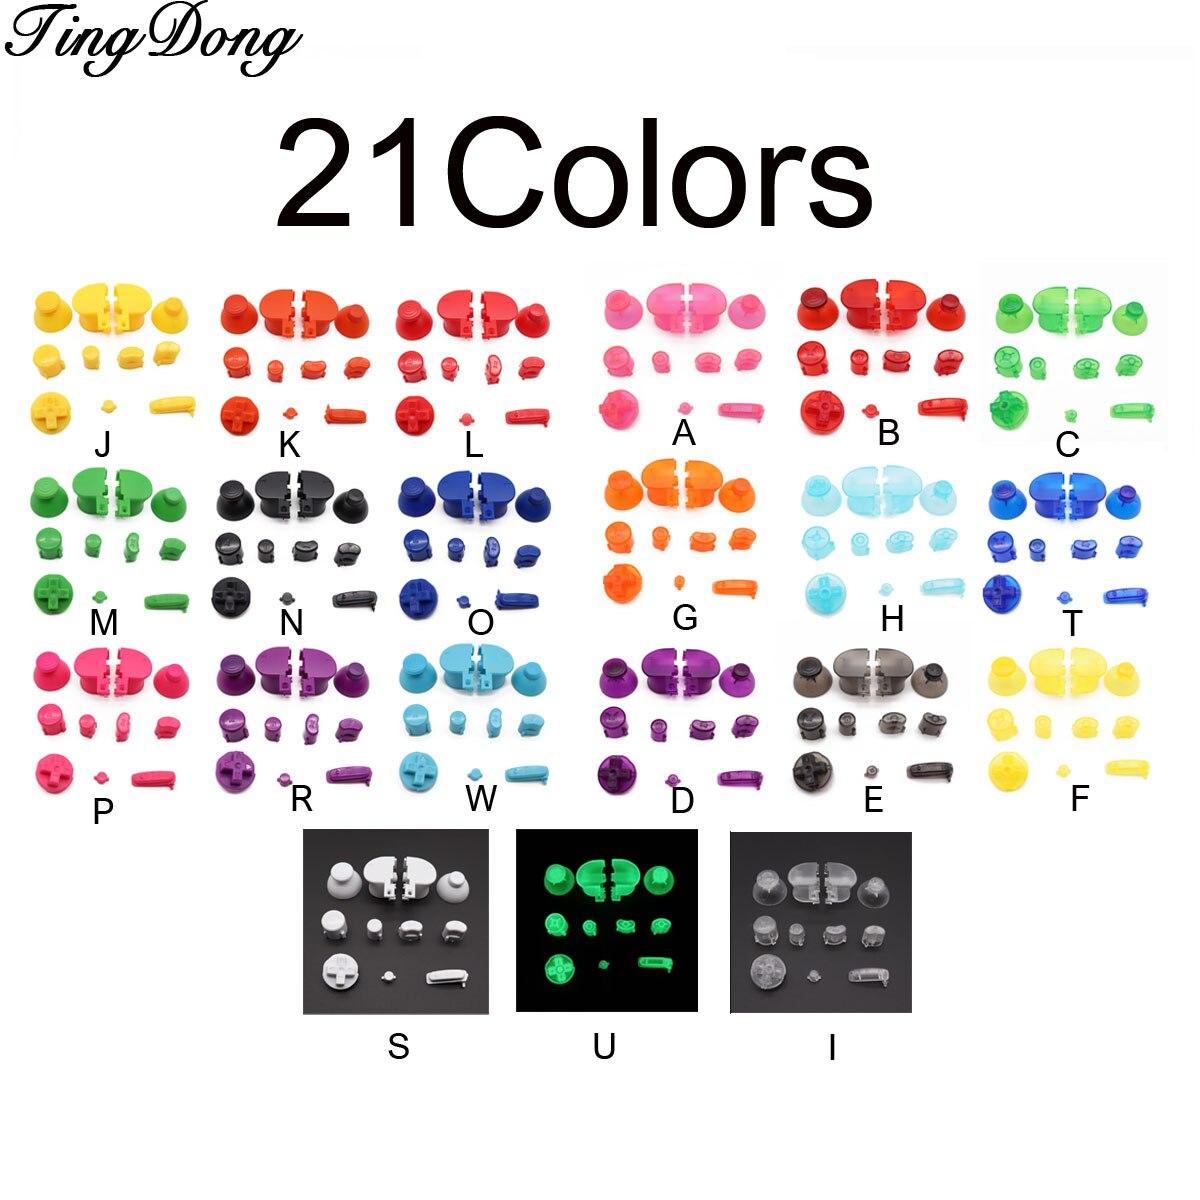 1 Juego de tapas de palanca de mando analógicas TingDong rojas Y negras, teclas Y botones X A B Z para controlador Nintendo Gamecube, mando análogo de joystick